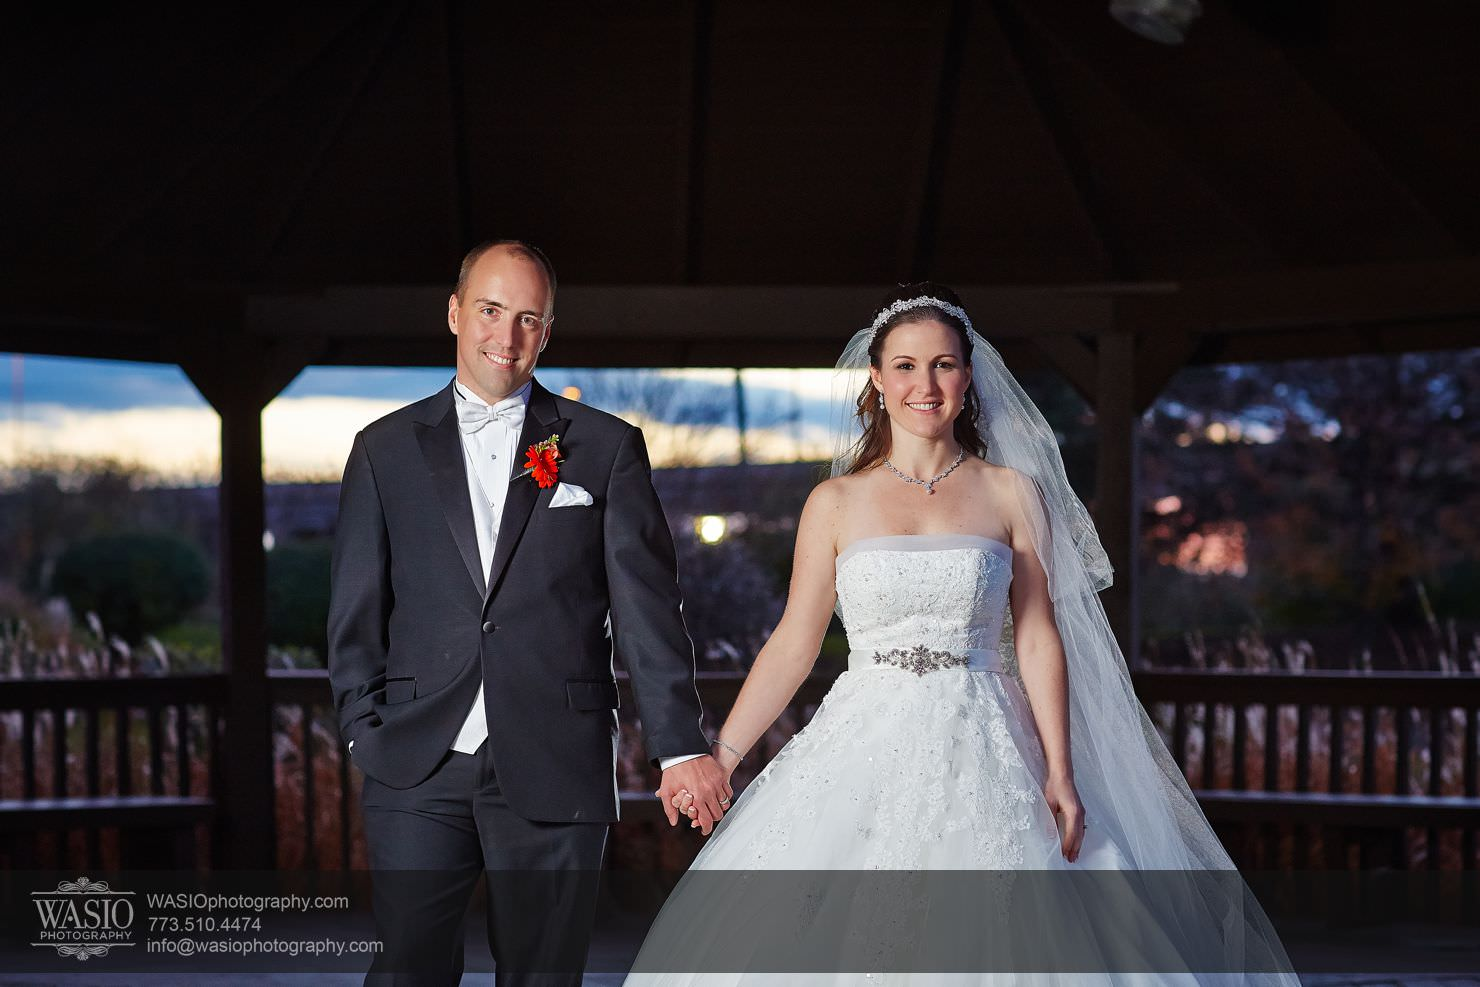 Rosemont-Fall-Wedding-Lauren-and-David-019 Rosemont Fall Wedding - Lauren + David